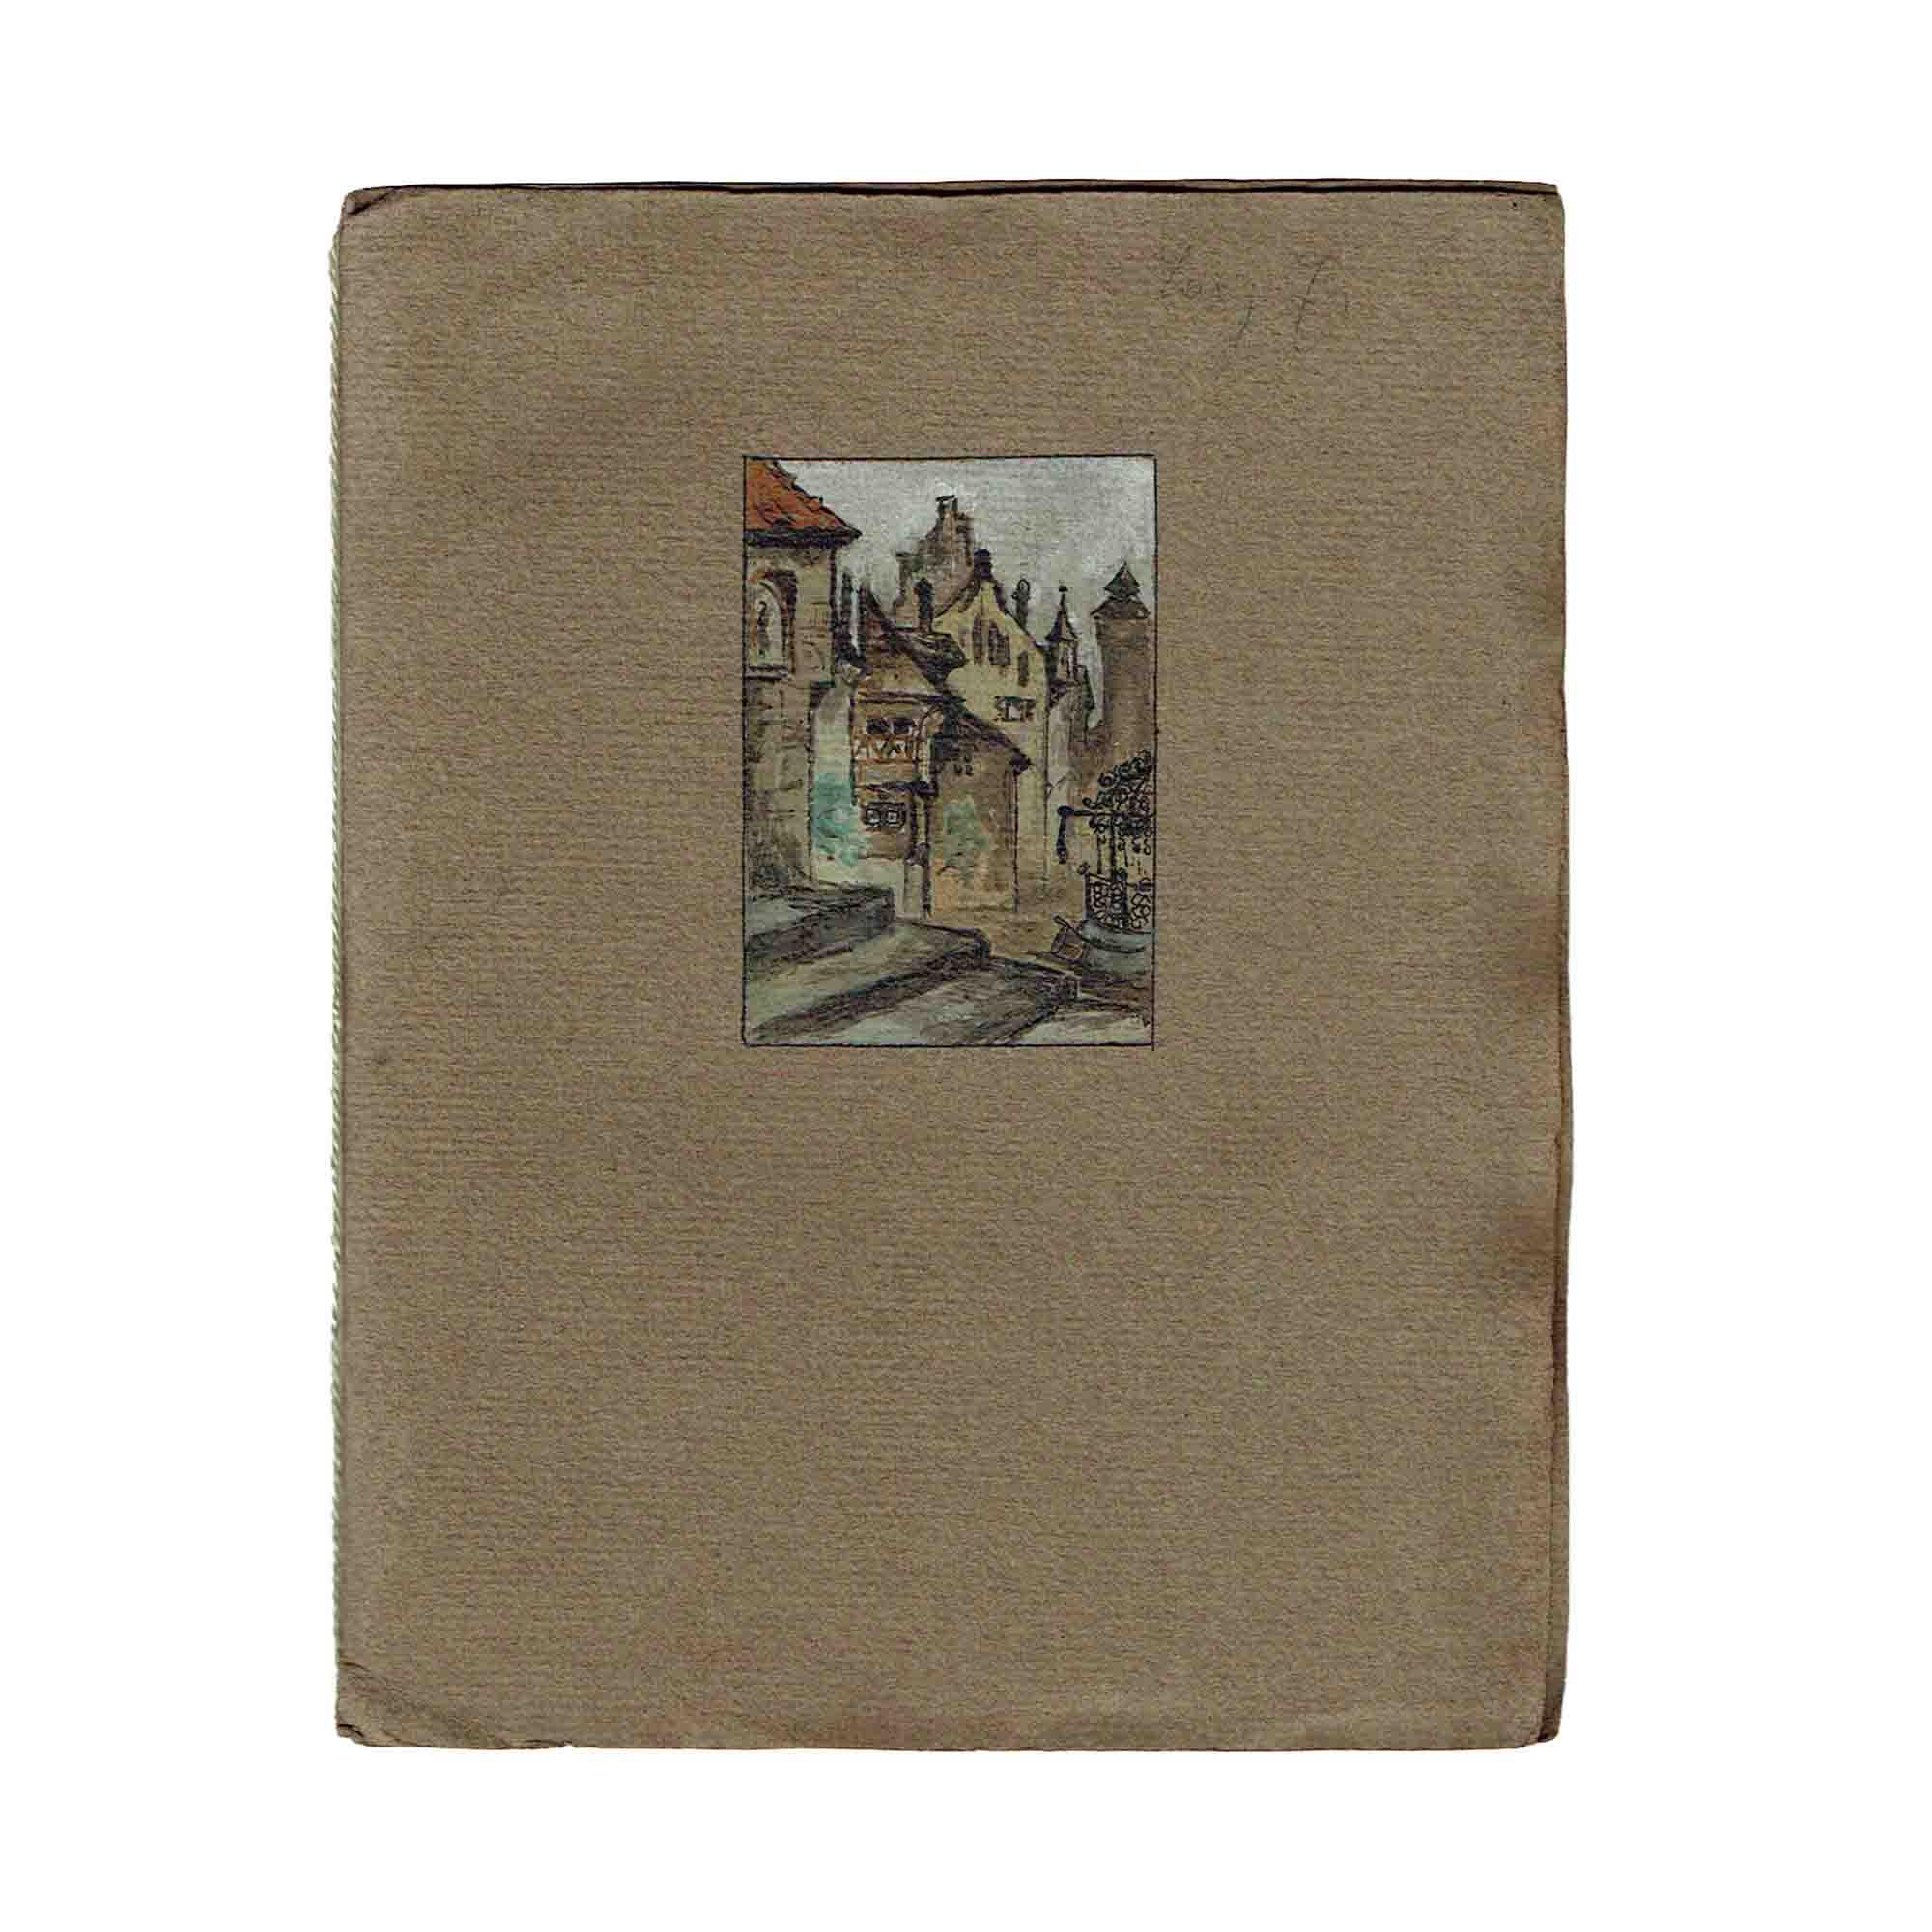 5293-Handschrift-Lang-Stadt-Mittelalter-1917-Umschlag-frei-N.jpg